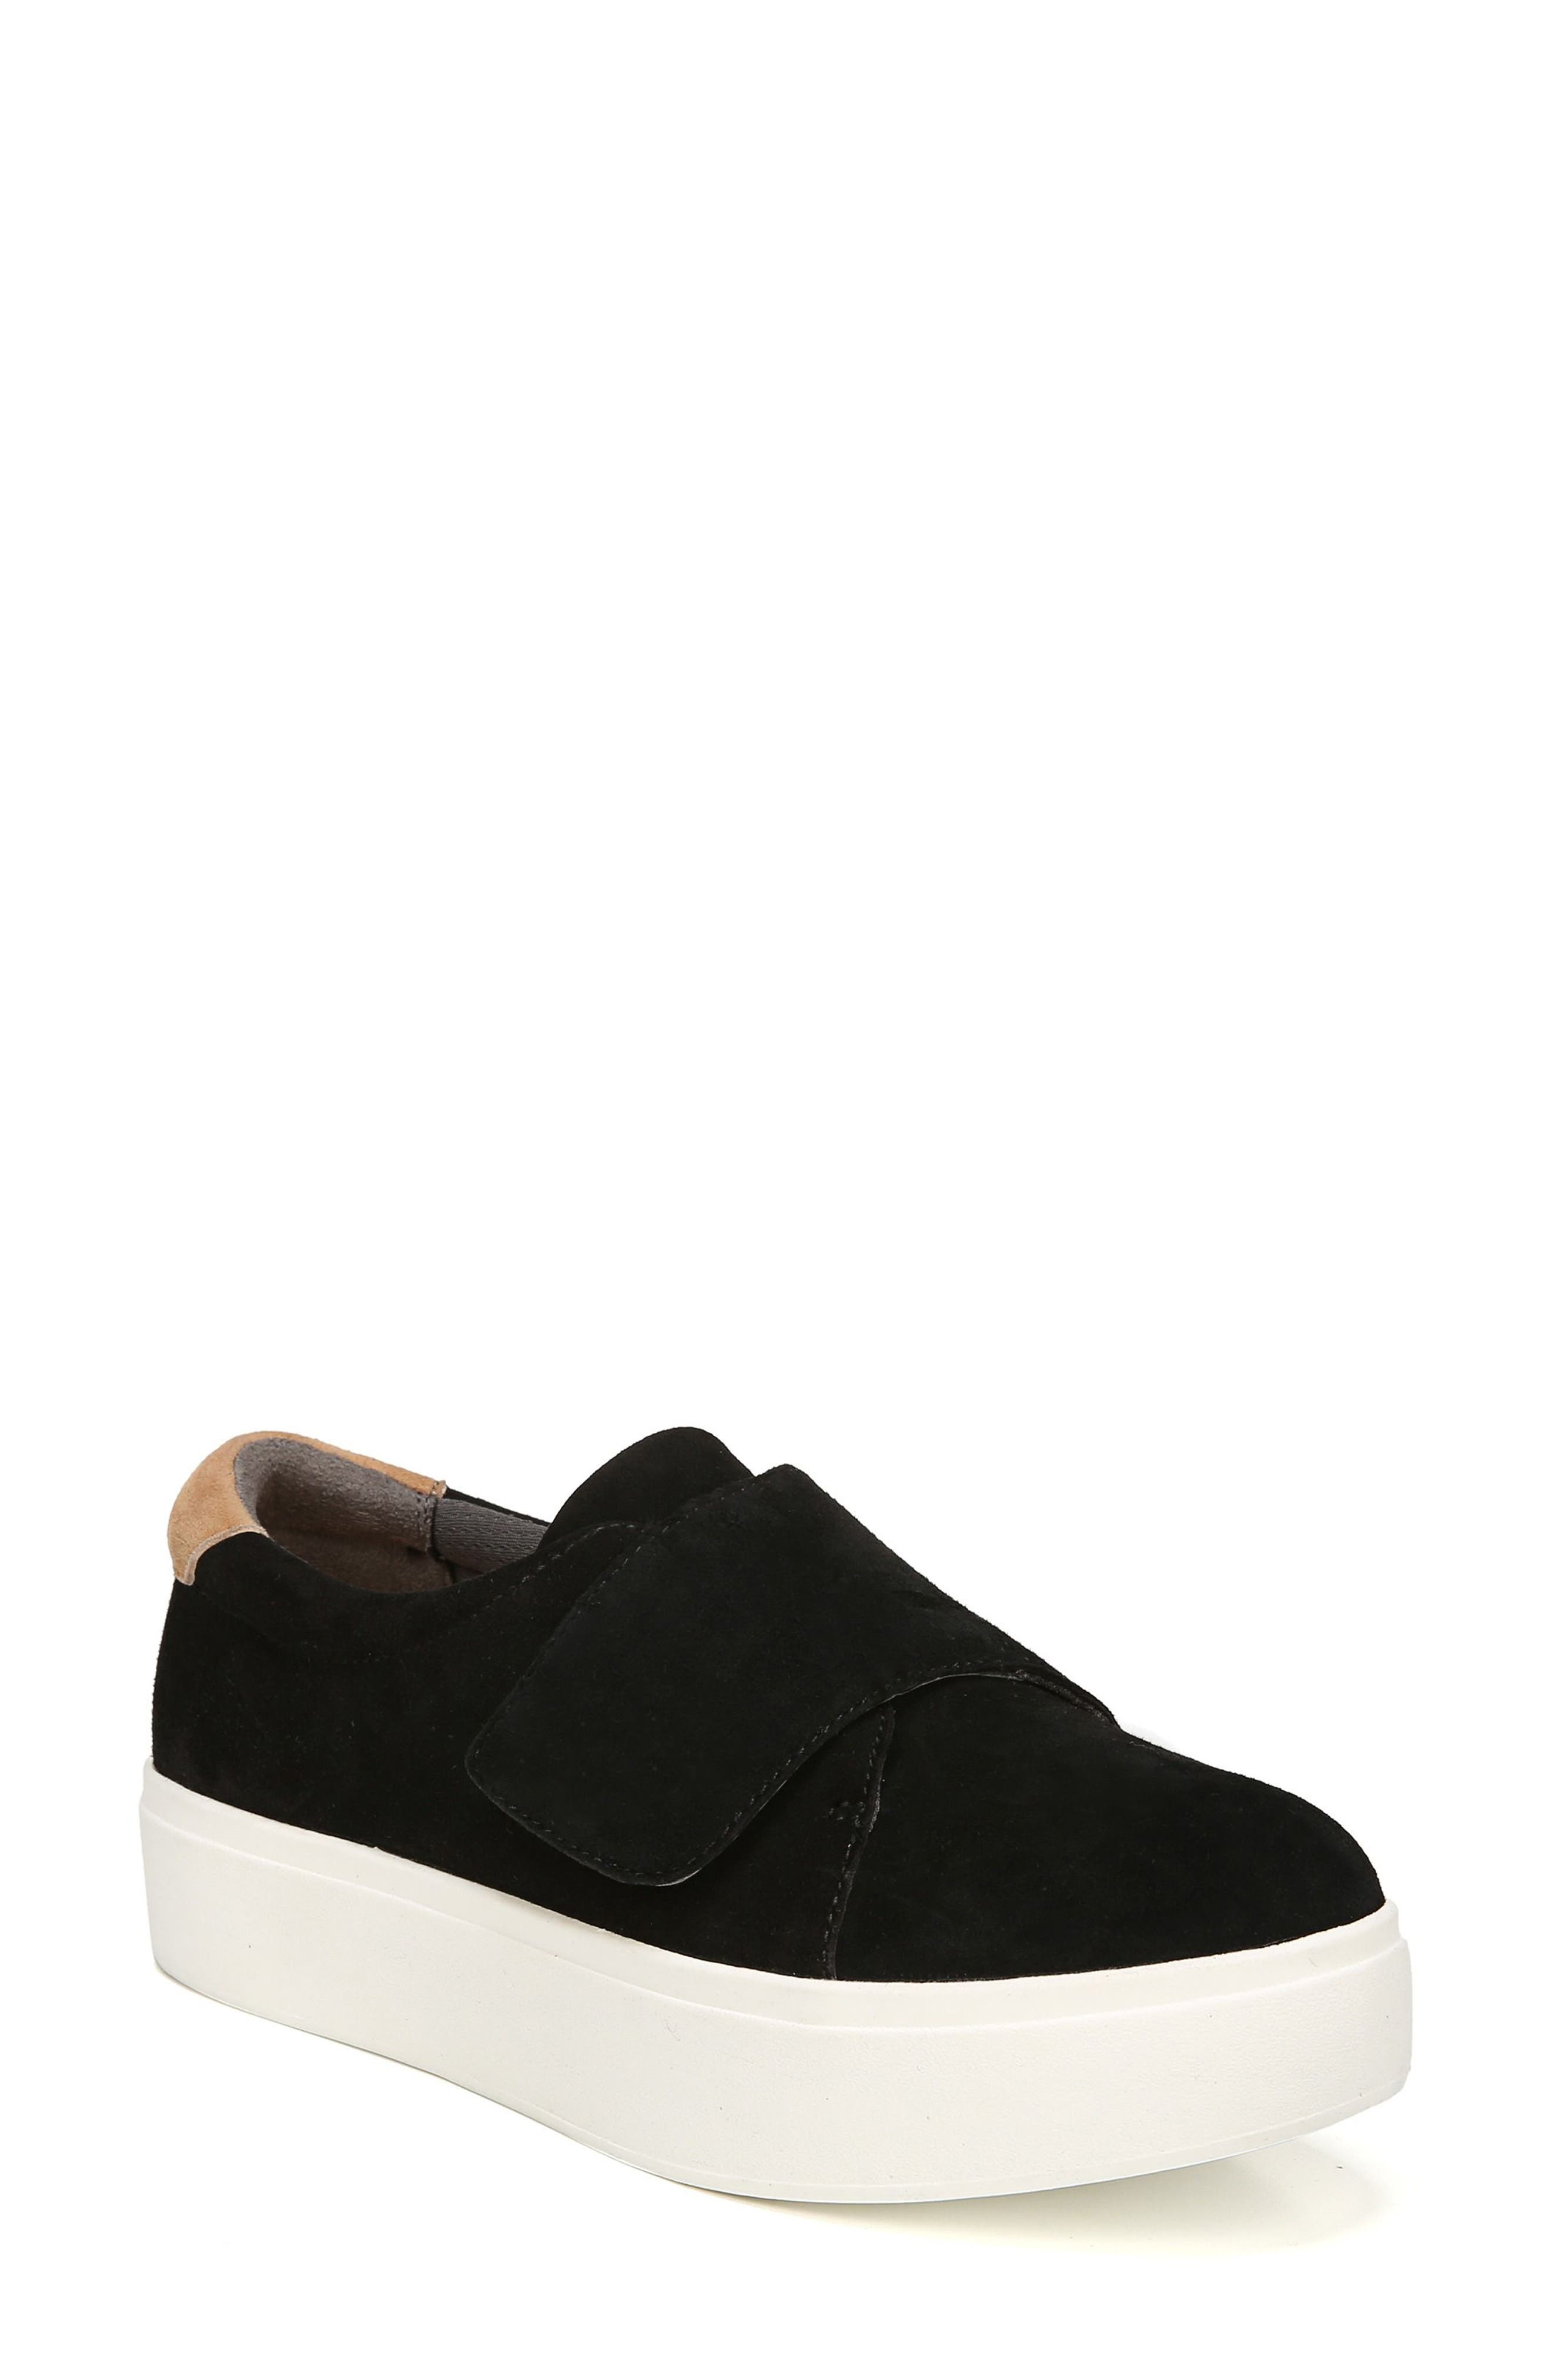 dc69e2ba9df Dr. Scholl s Abbot Band Sneaker- Black